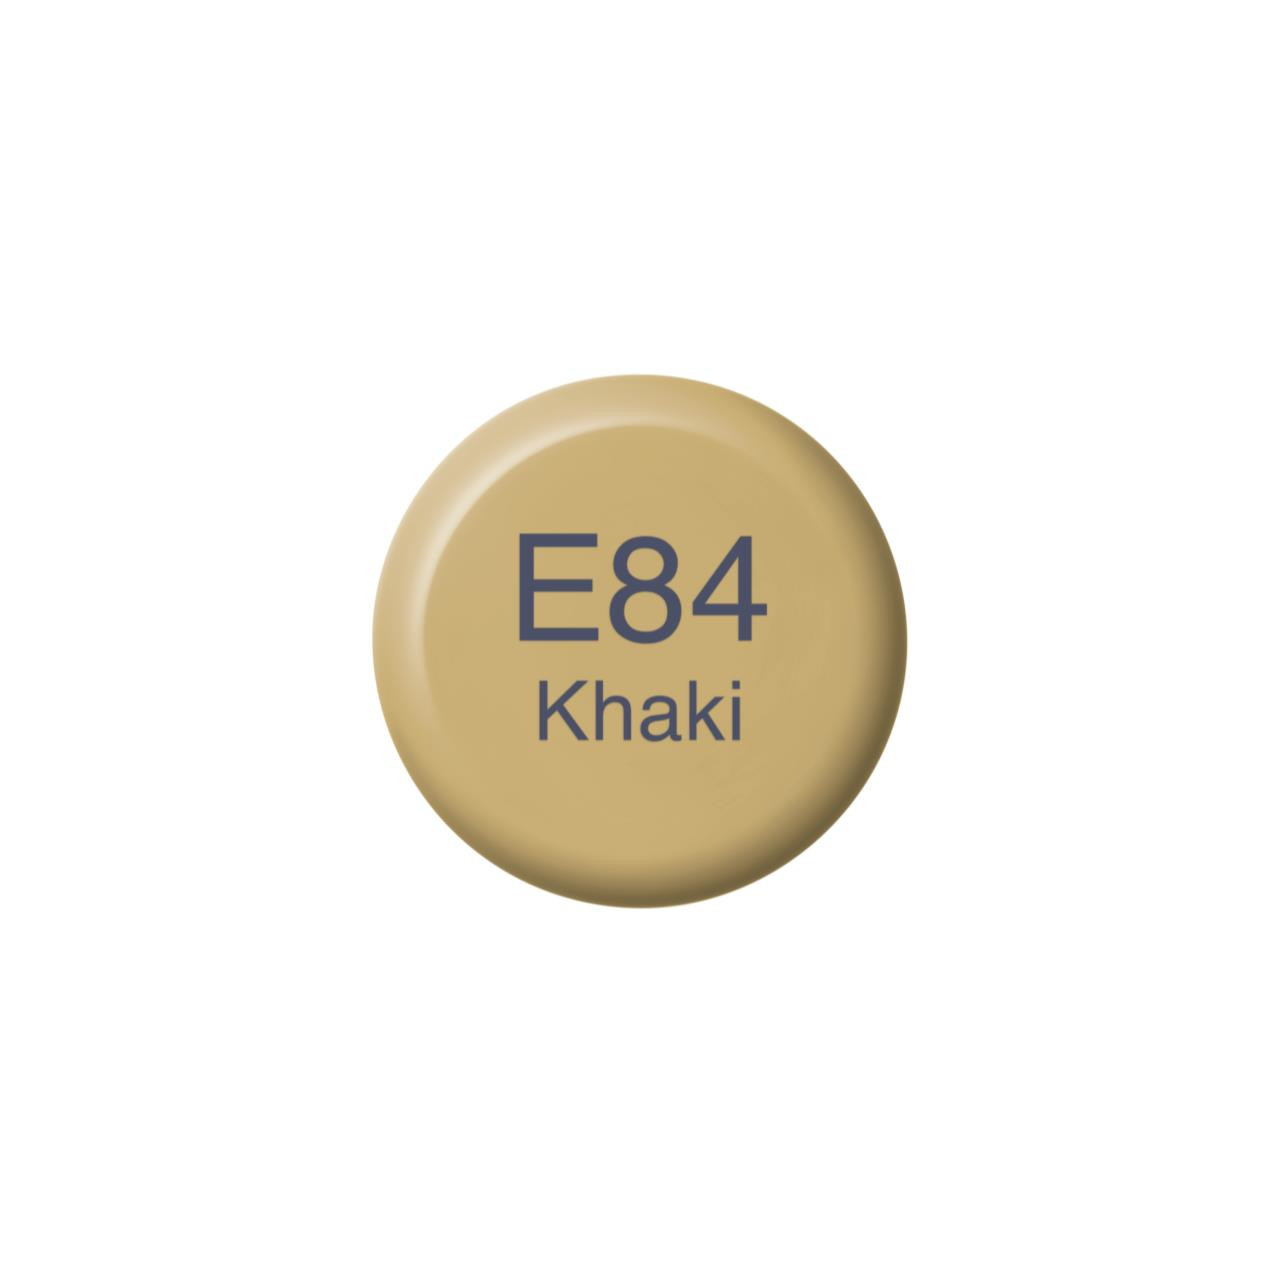 E84 Khaki, Copic Ink - 4511338057049